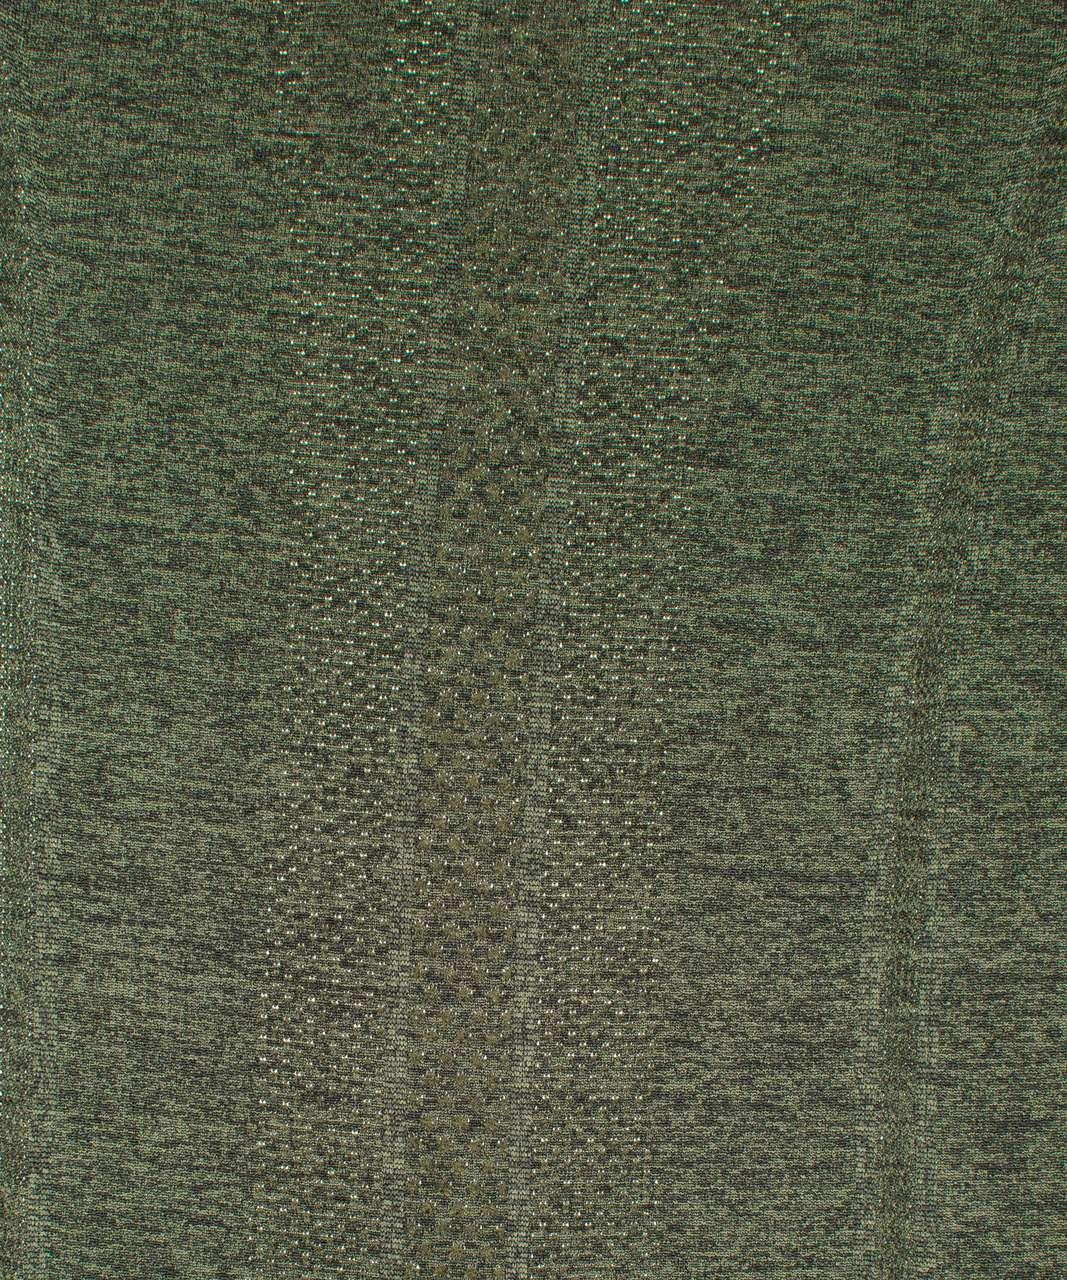 Lululemon Swiftly Tech Long Sleeve Crew - Barracks Green / Black